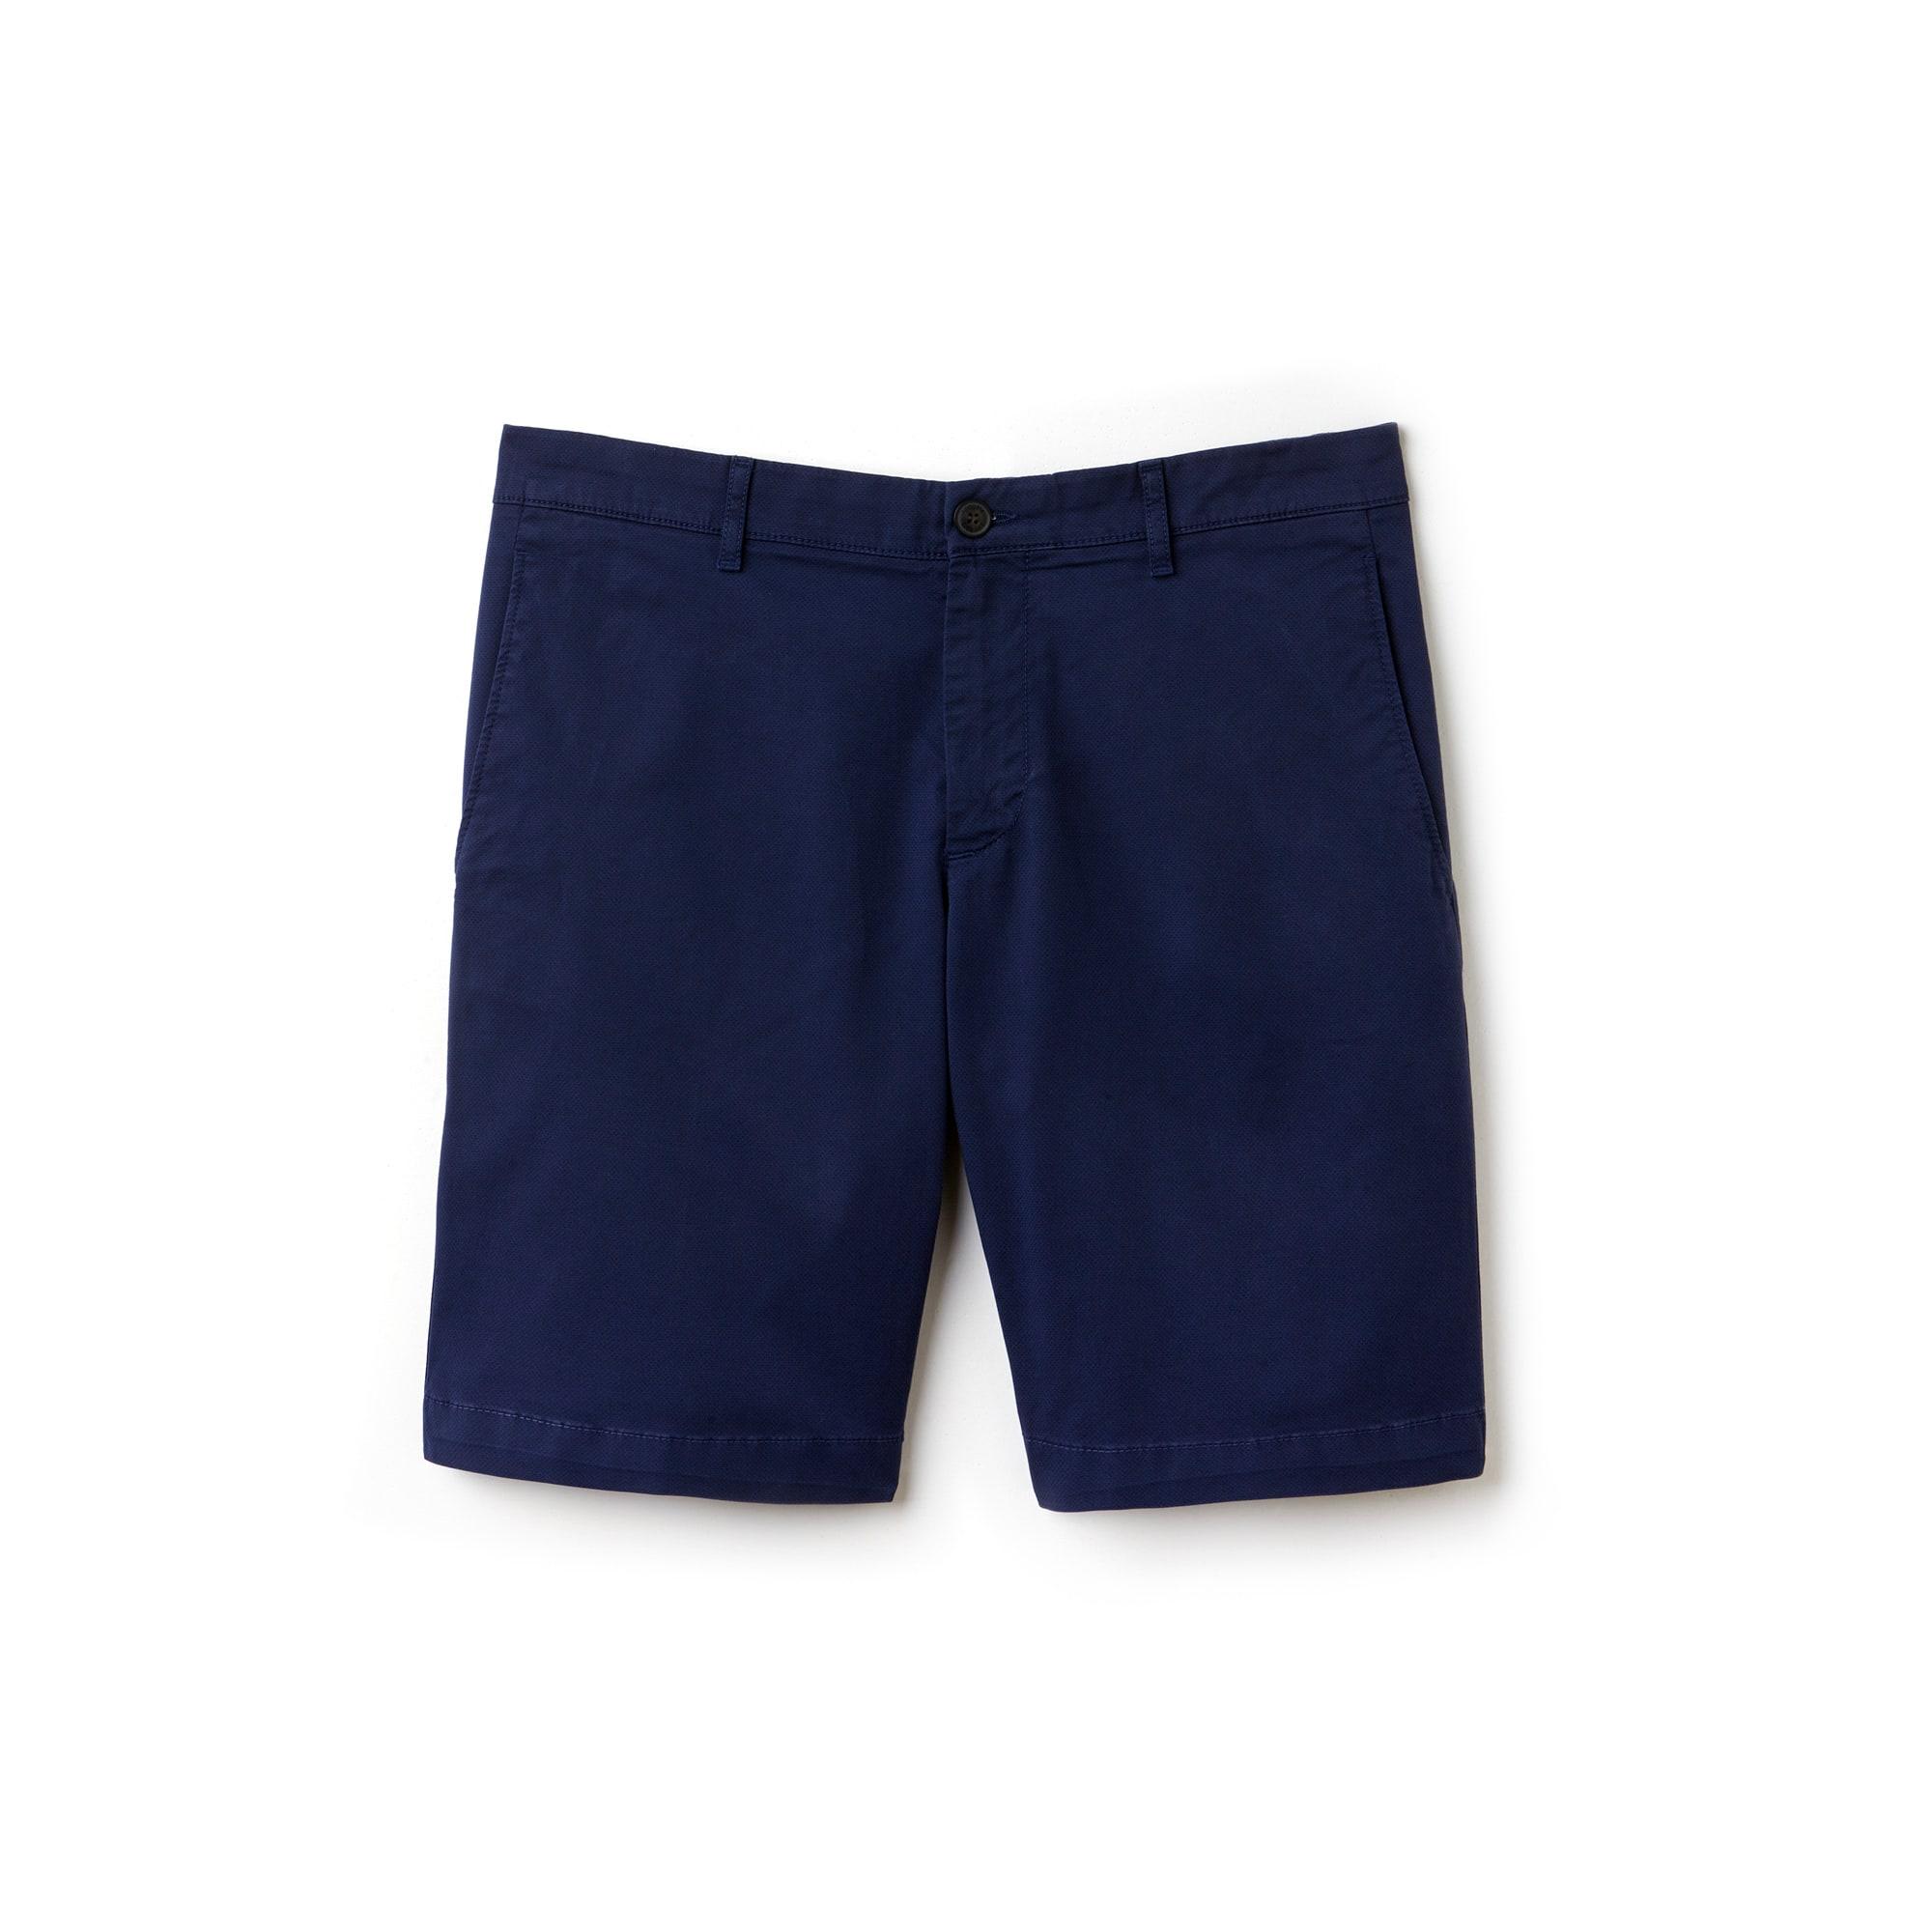 Men's Slim Fit Mini Print Stretch Cotton Twill Bermuda Shorts